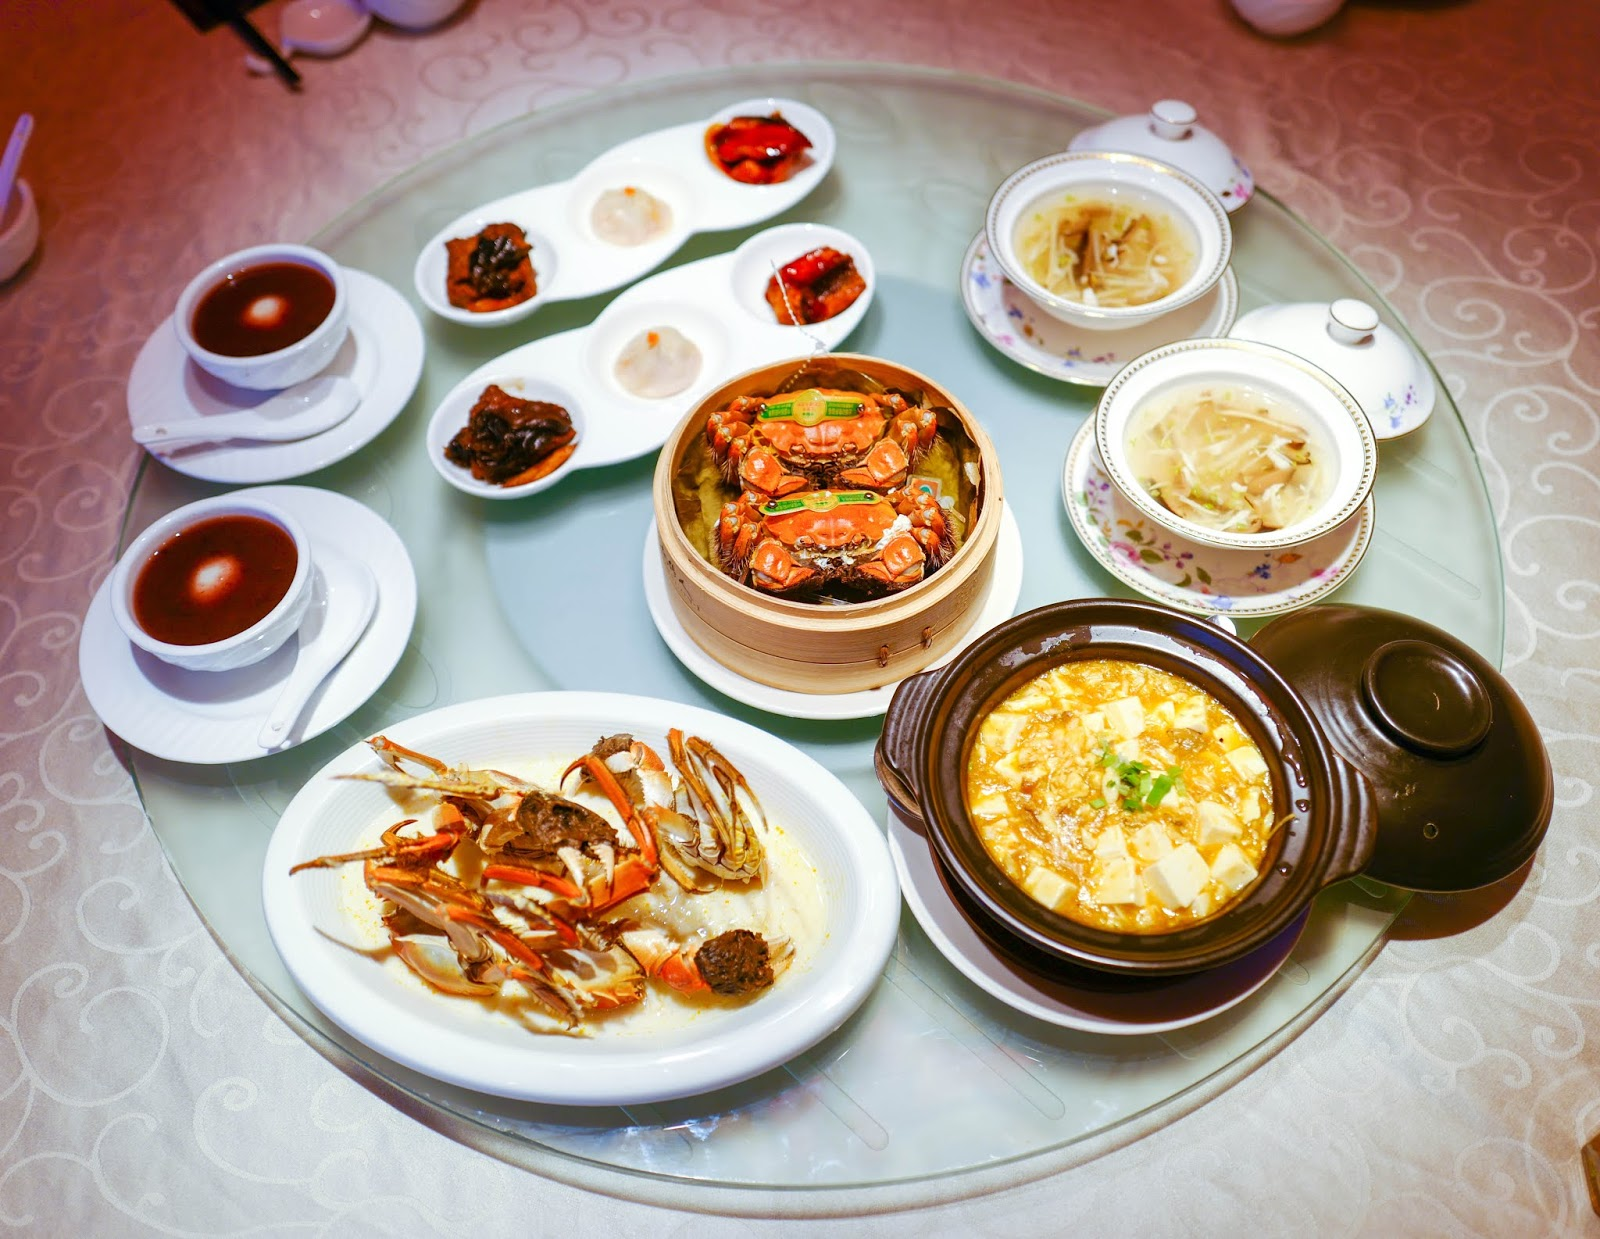 dragon-i: yangcheng lake hairy crabs return